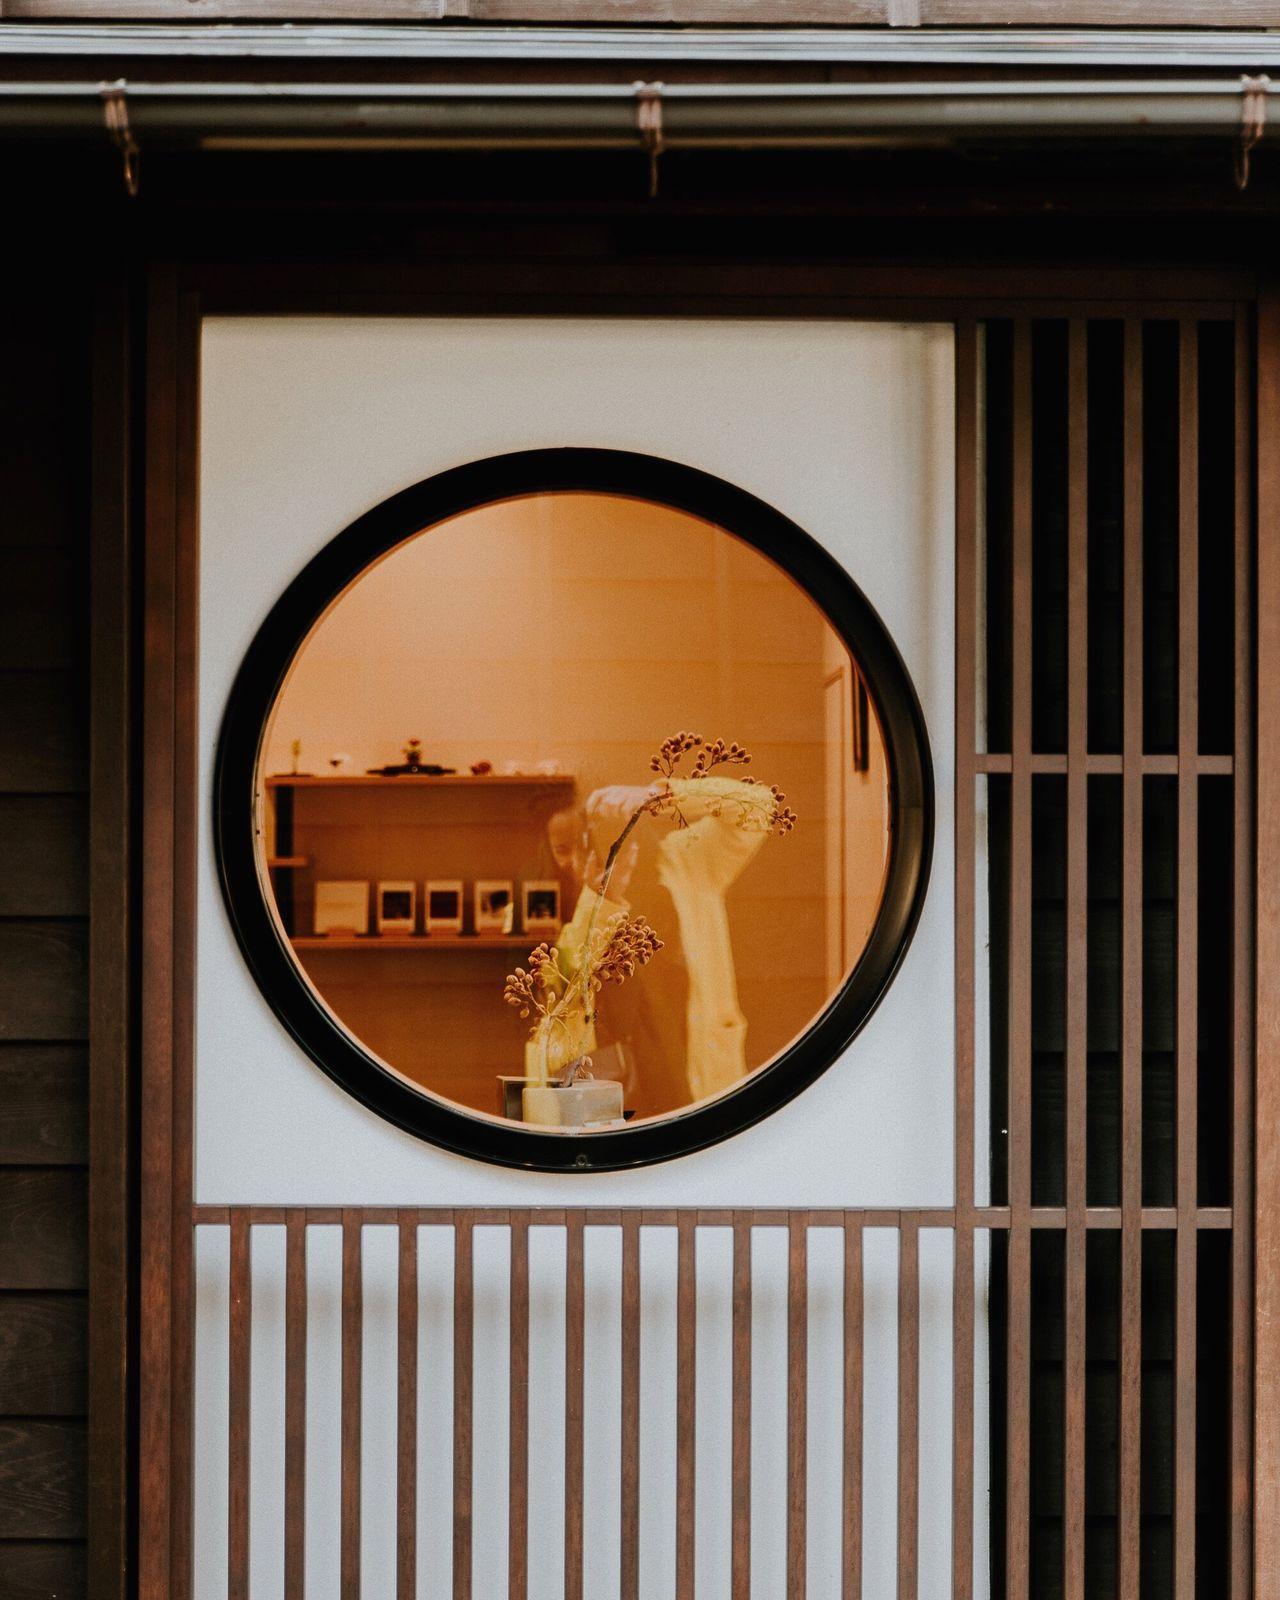 Wandering in the streets of Kanazawa ✨ Architecture The Week On EyeEm Japanese Culture Japan Photography Japan Travel Travel Photography Things I Like EyeEm Best Edits EyeEmBestPics Geometric Shape Travel Destinations Building Exterior Architecture